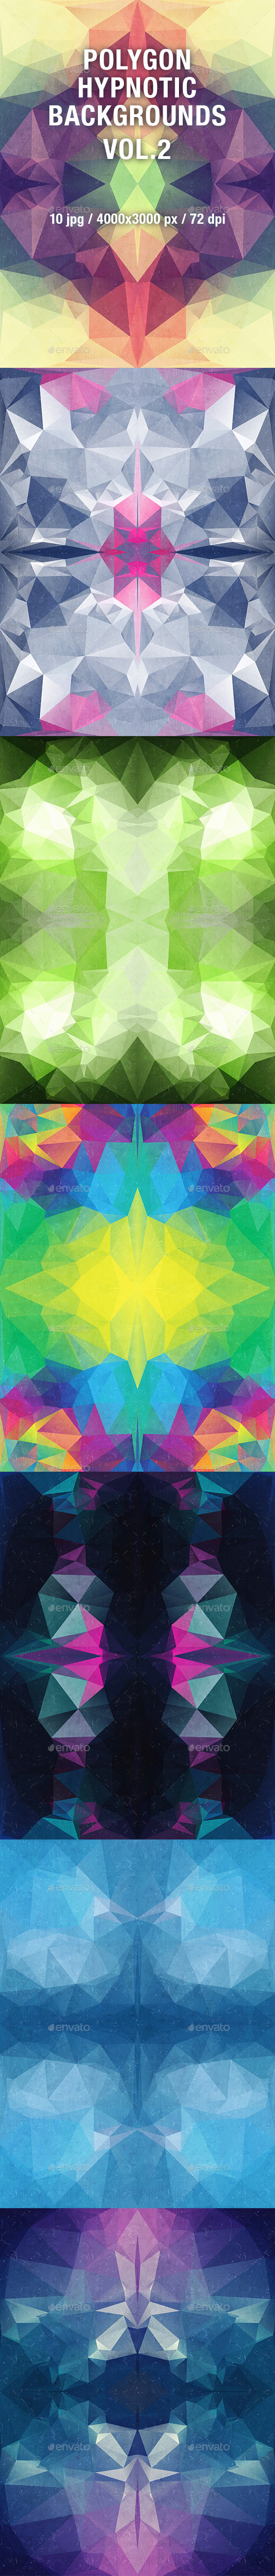 Polygon Hypnotic Backgrounds Vol.2